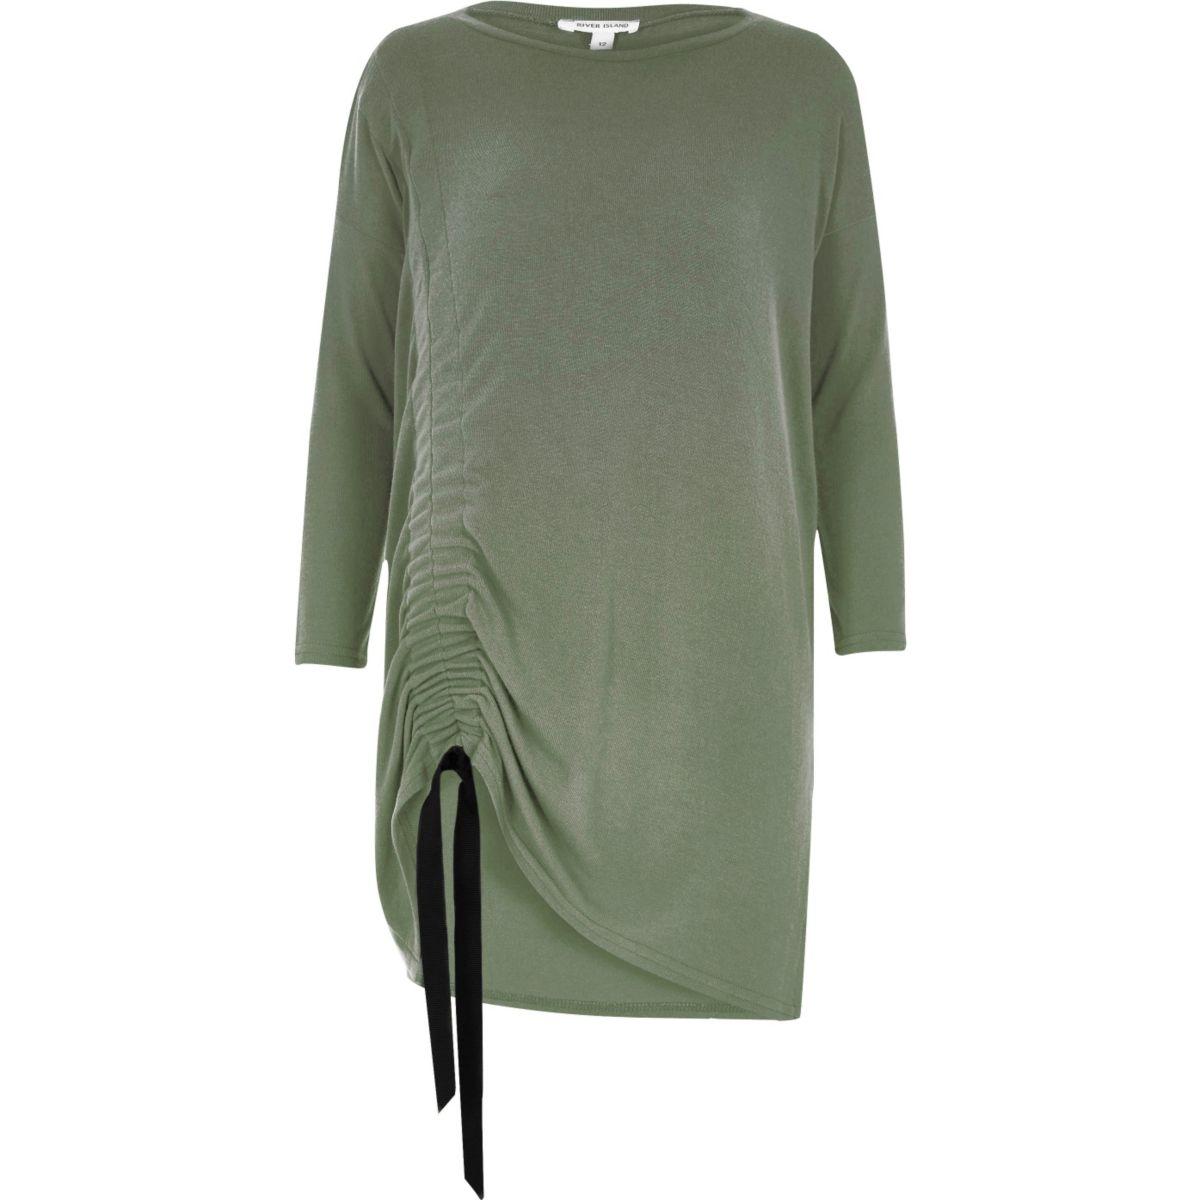 Green ruched drawstring knit top